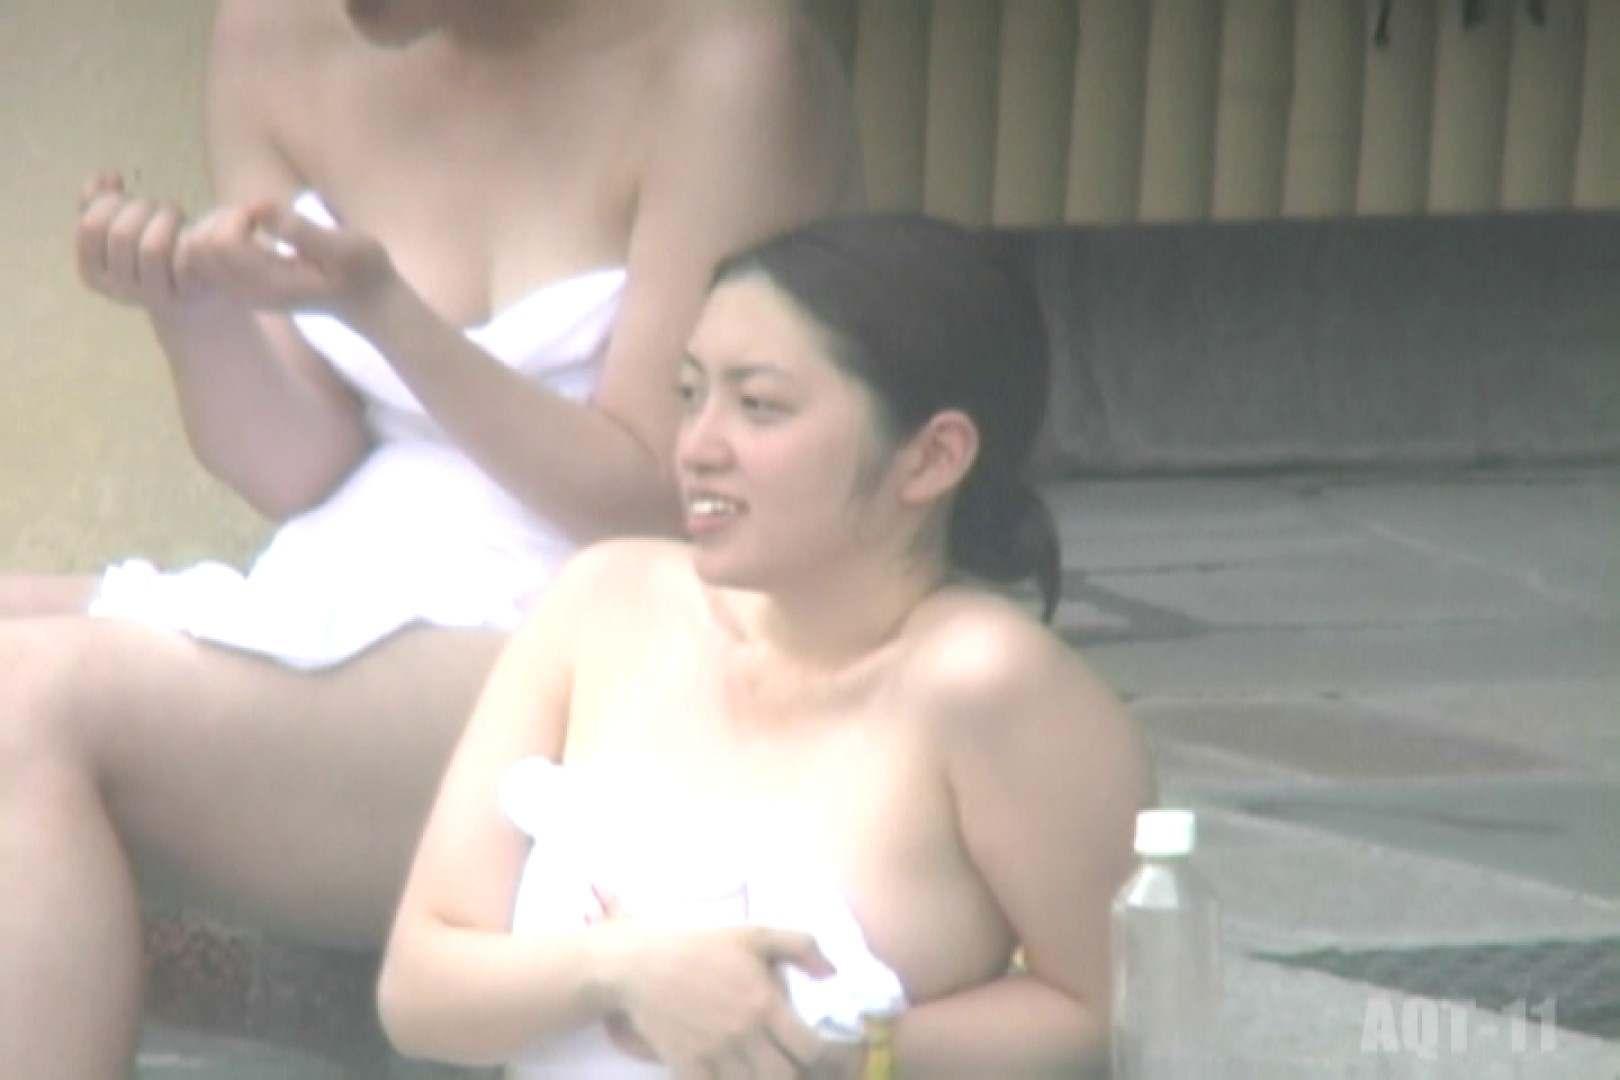 Aquaな露天風呂Vol.803 露天 濡れ場動画紹介 10pic 8